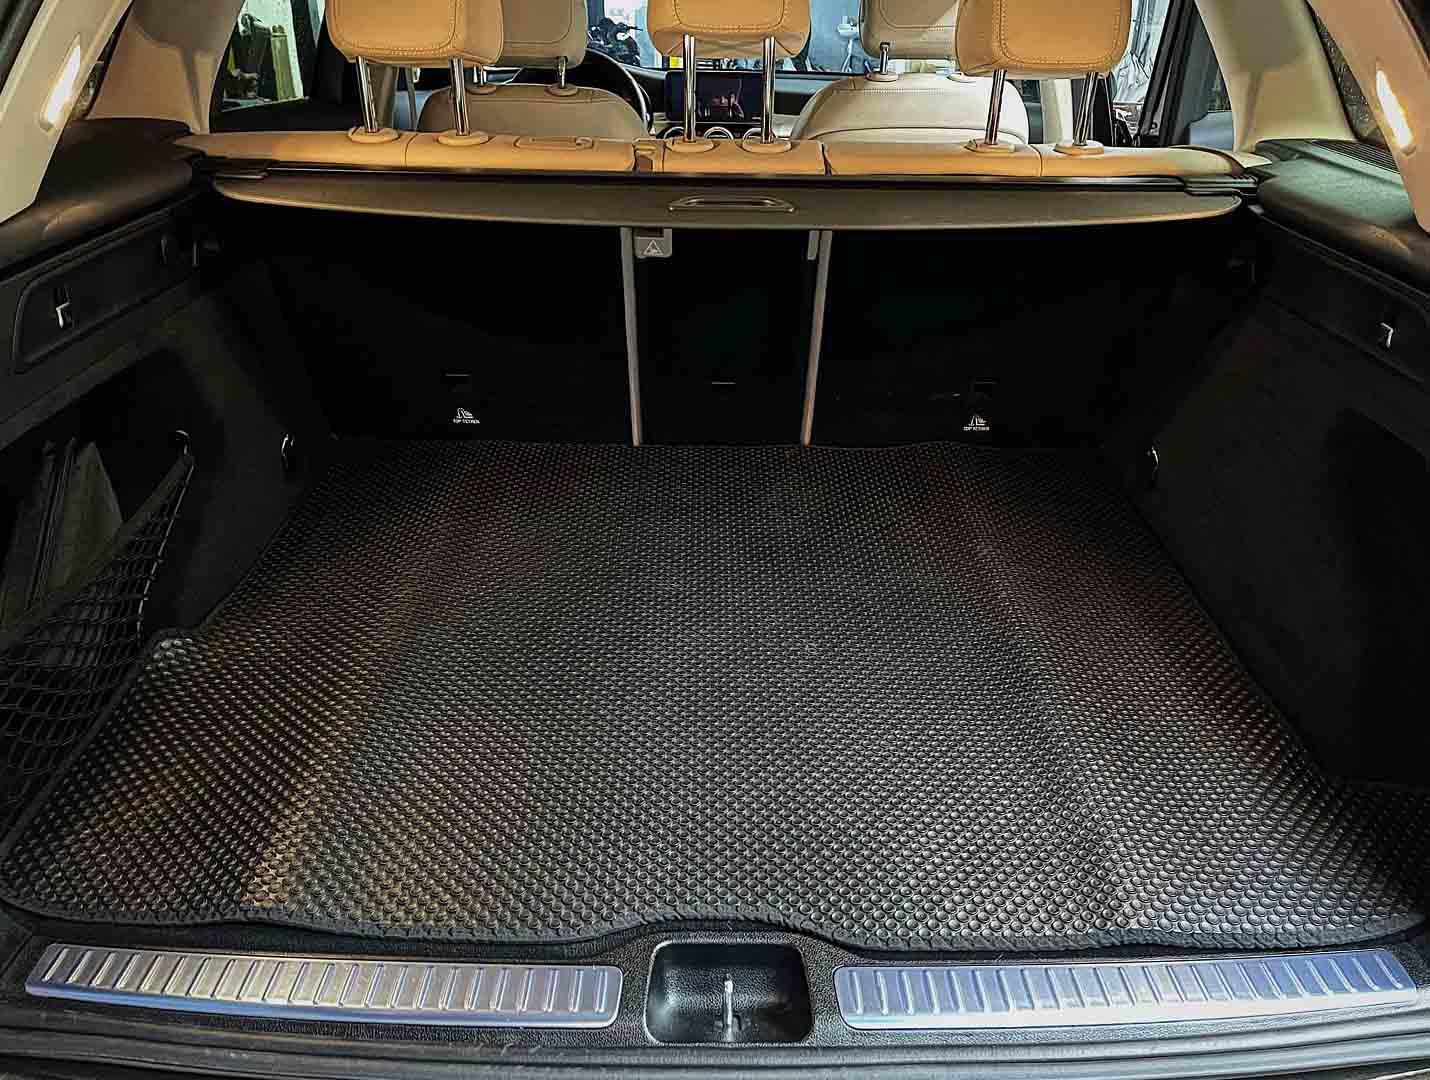 Thảm lót cốp Mercedes GLC 2021